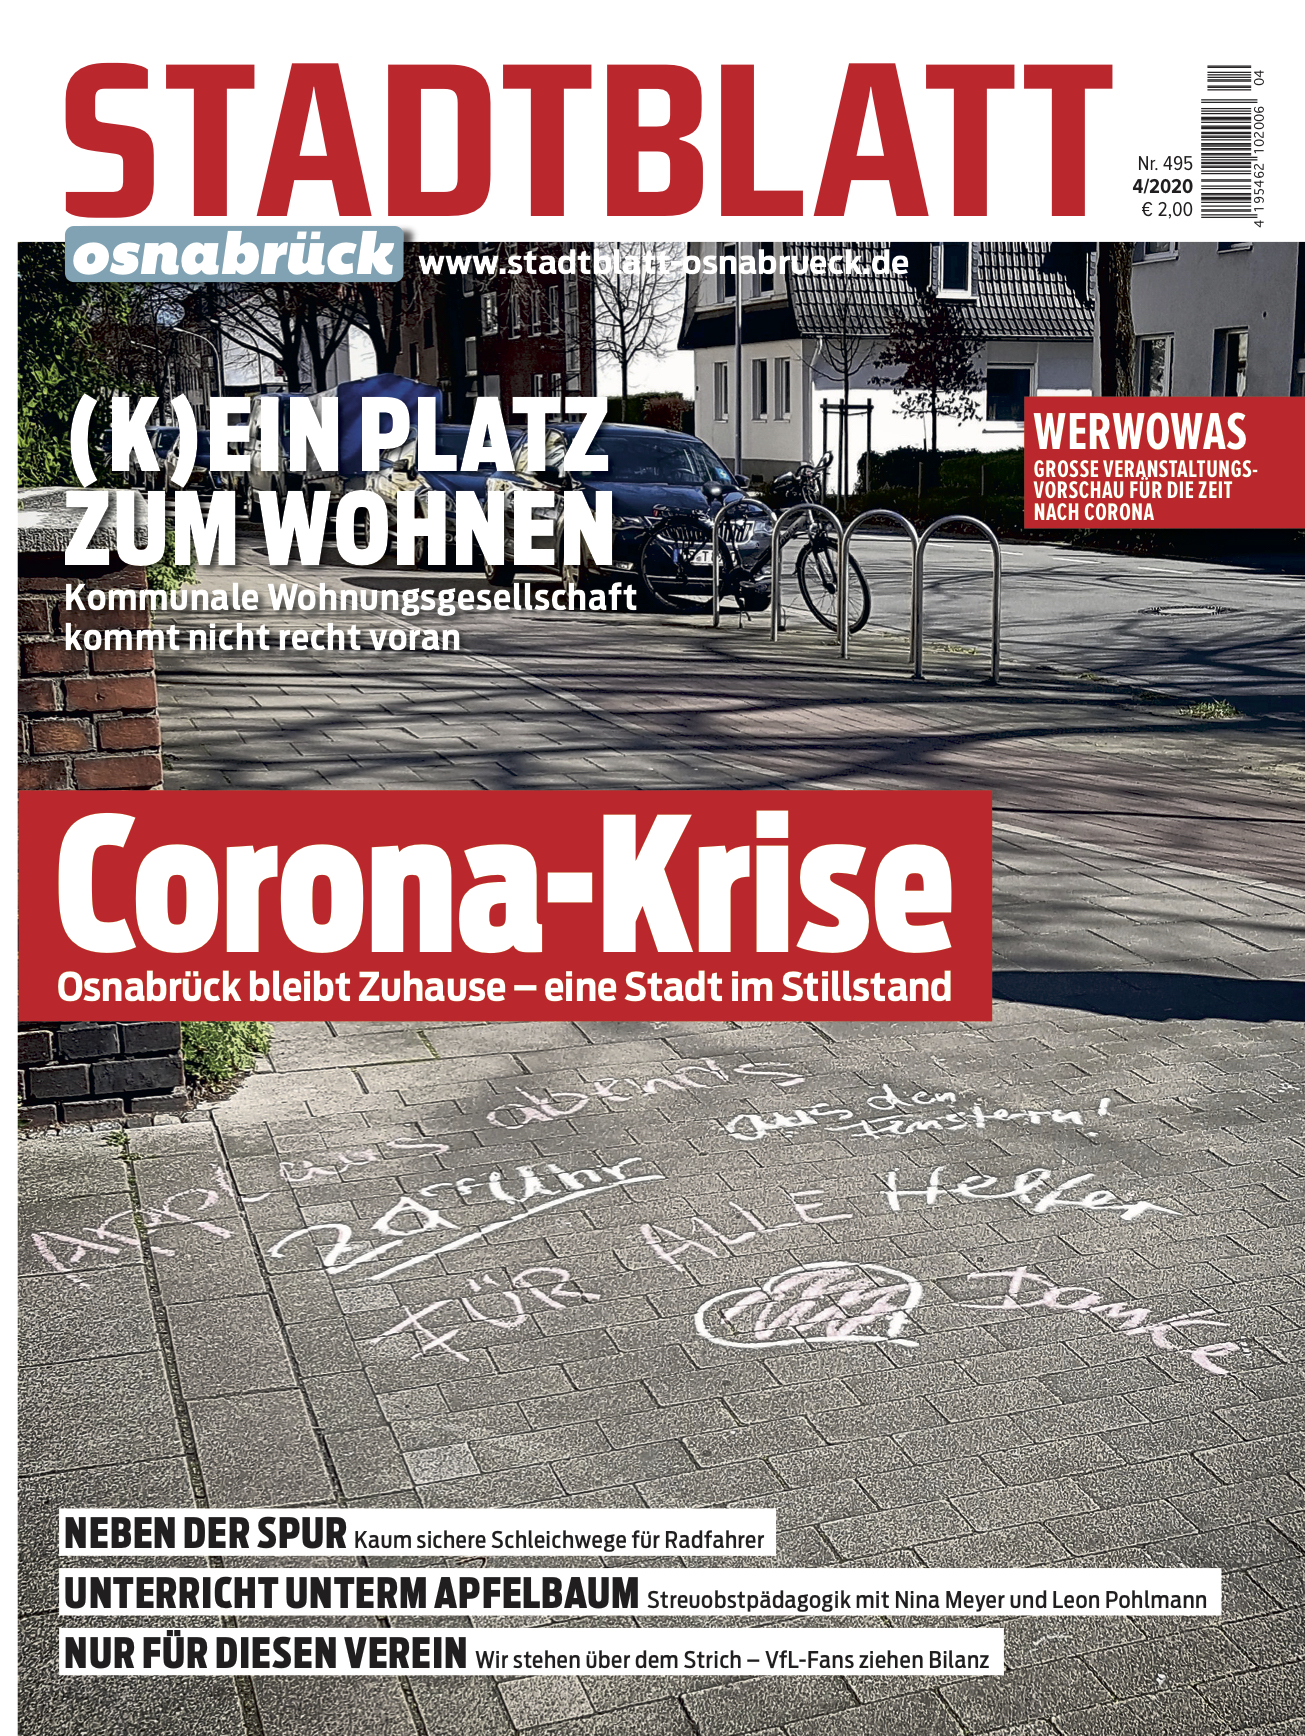 Stadtblatt_2020.04